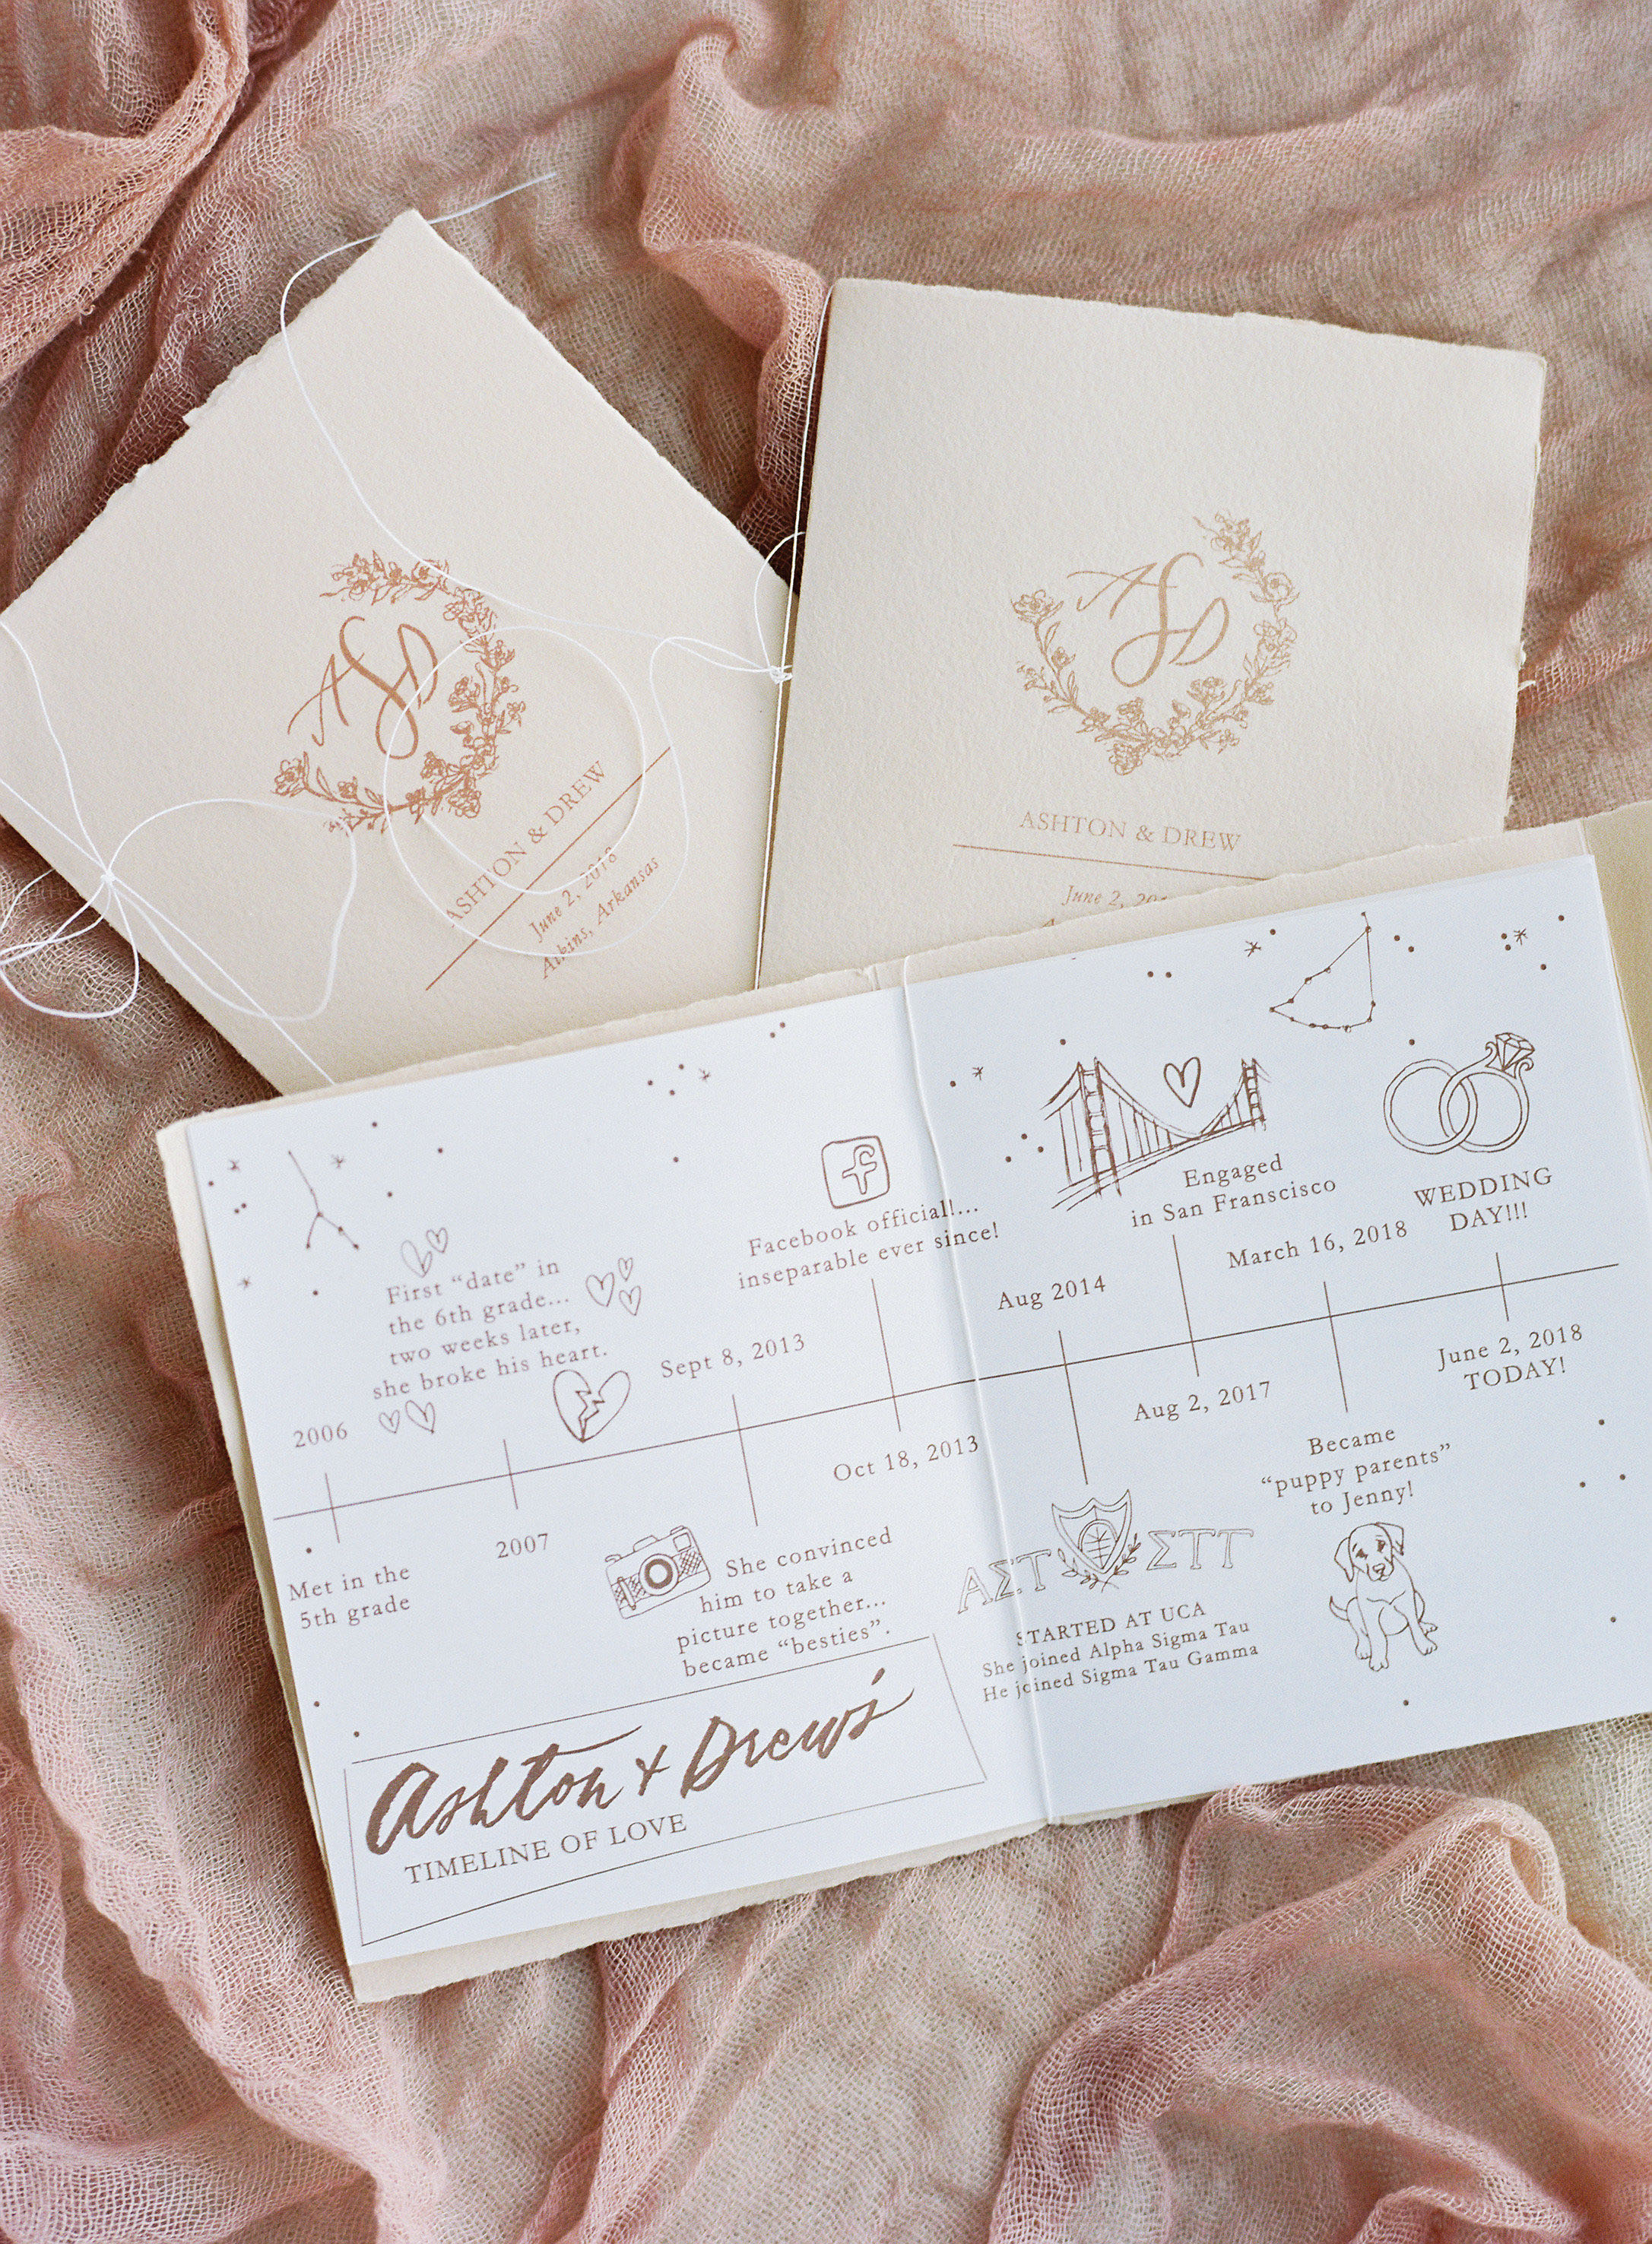 wedding program booklet homemade peach colored paper